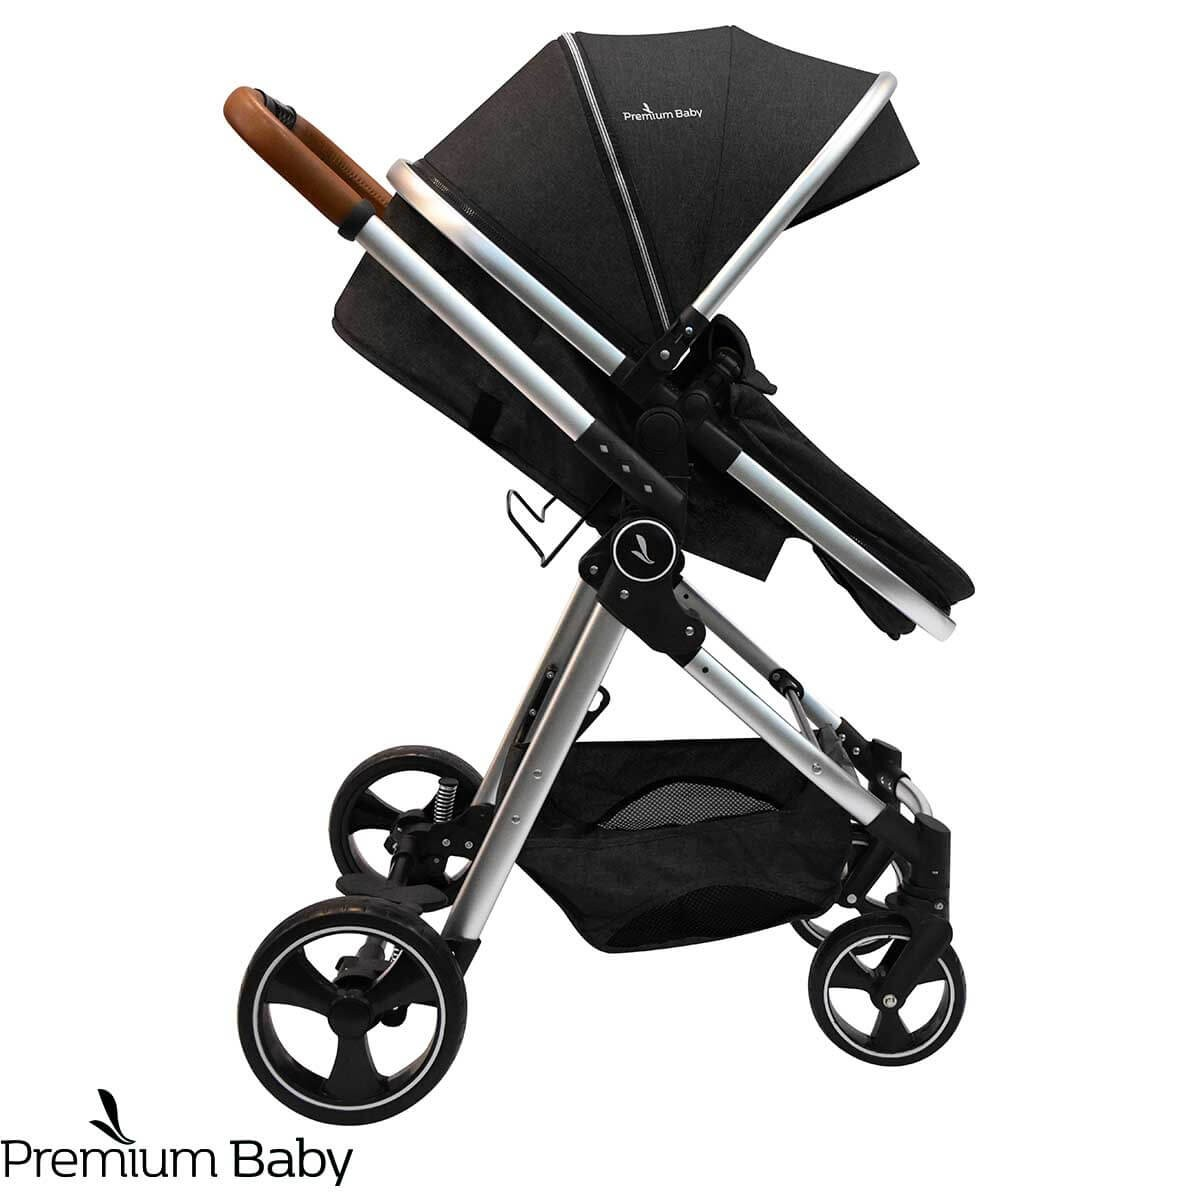 COCHECITO 3 EN 1 PREMIUM BABY NEW MIKE LUX